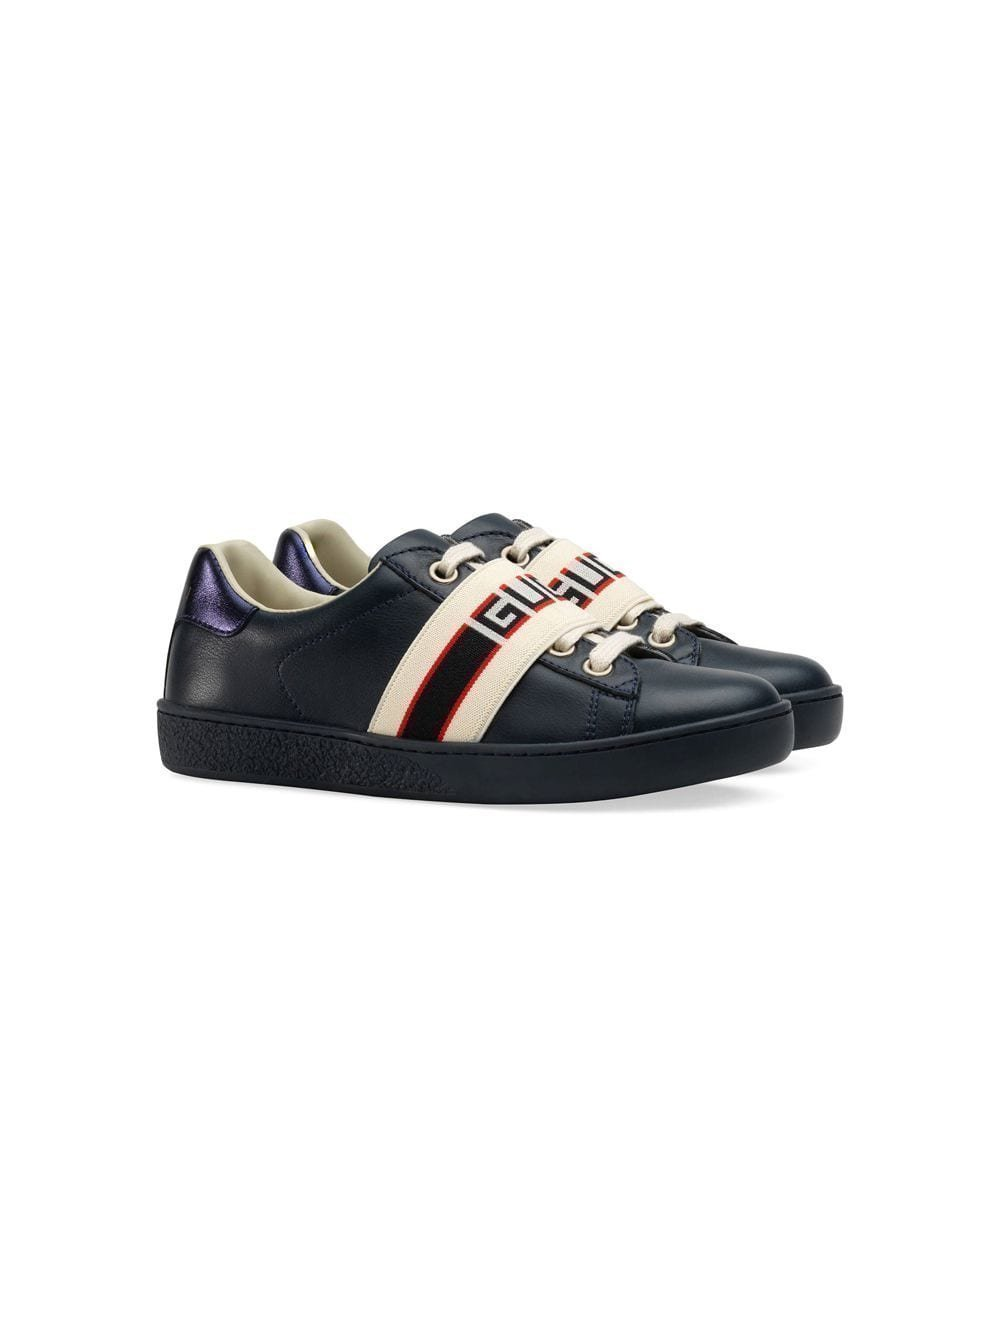 fe81be62fc4 Gucci Kids Gucci Kinderen Ace sneaker met streep - Blauw ...